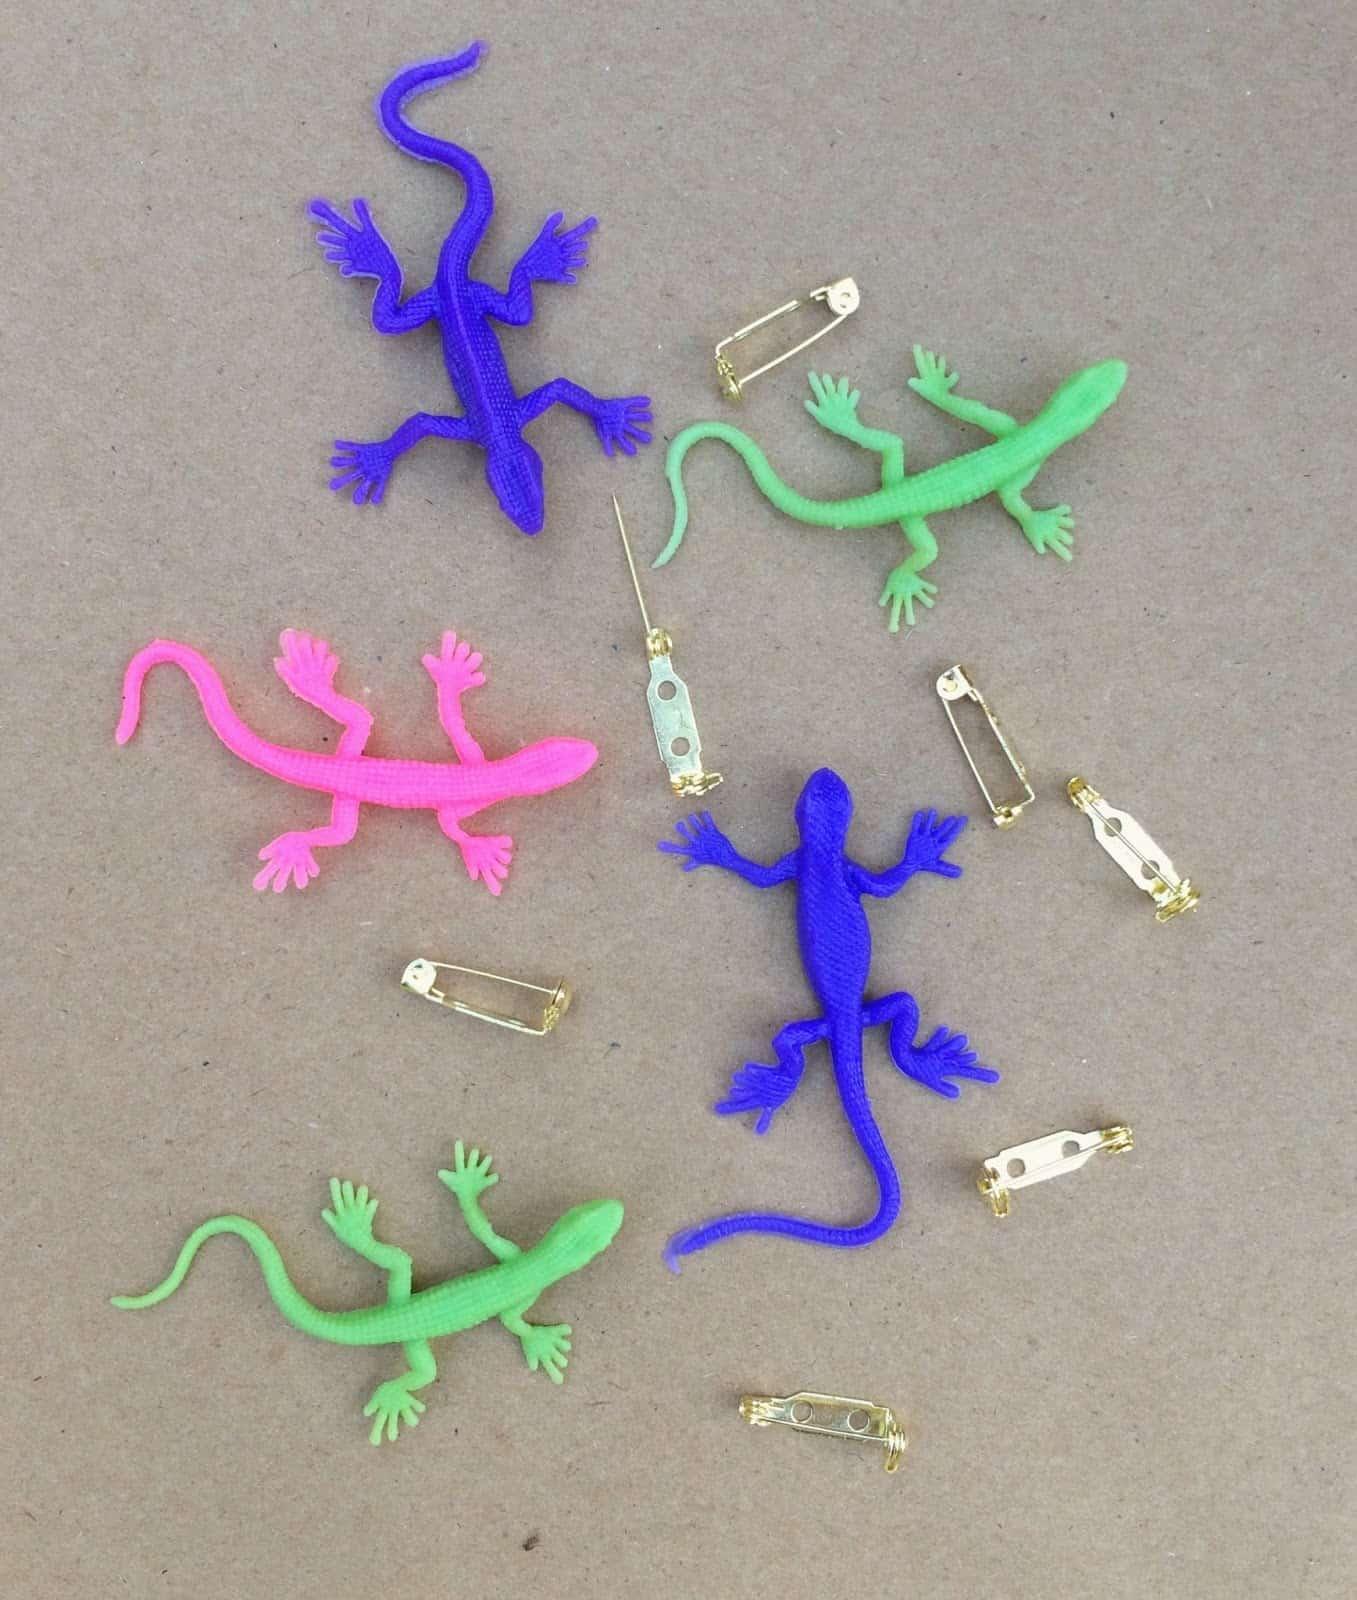 Lizard clothing pins